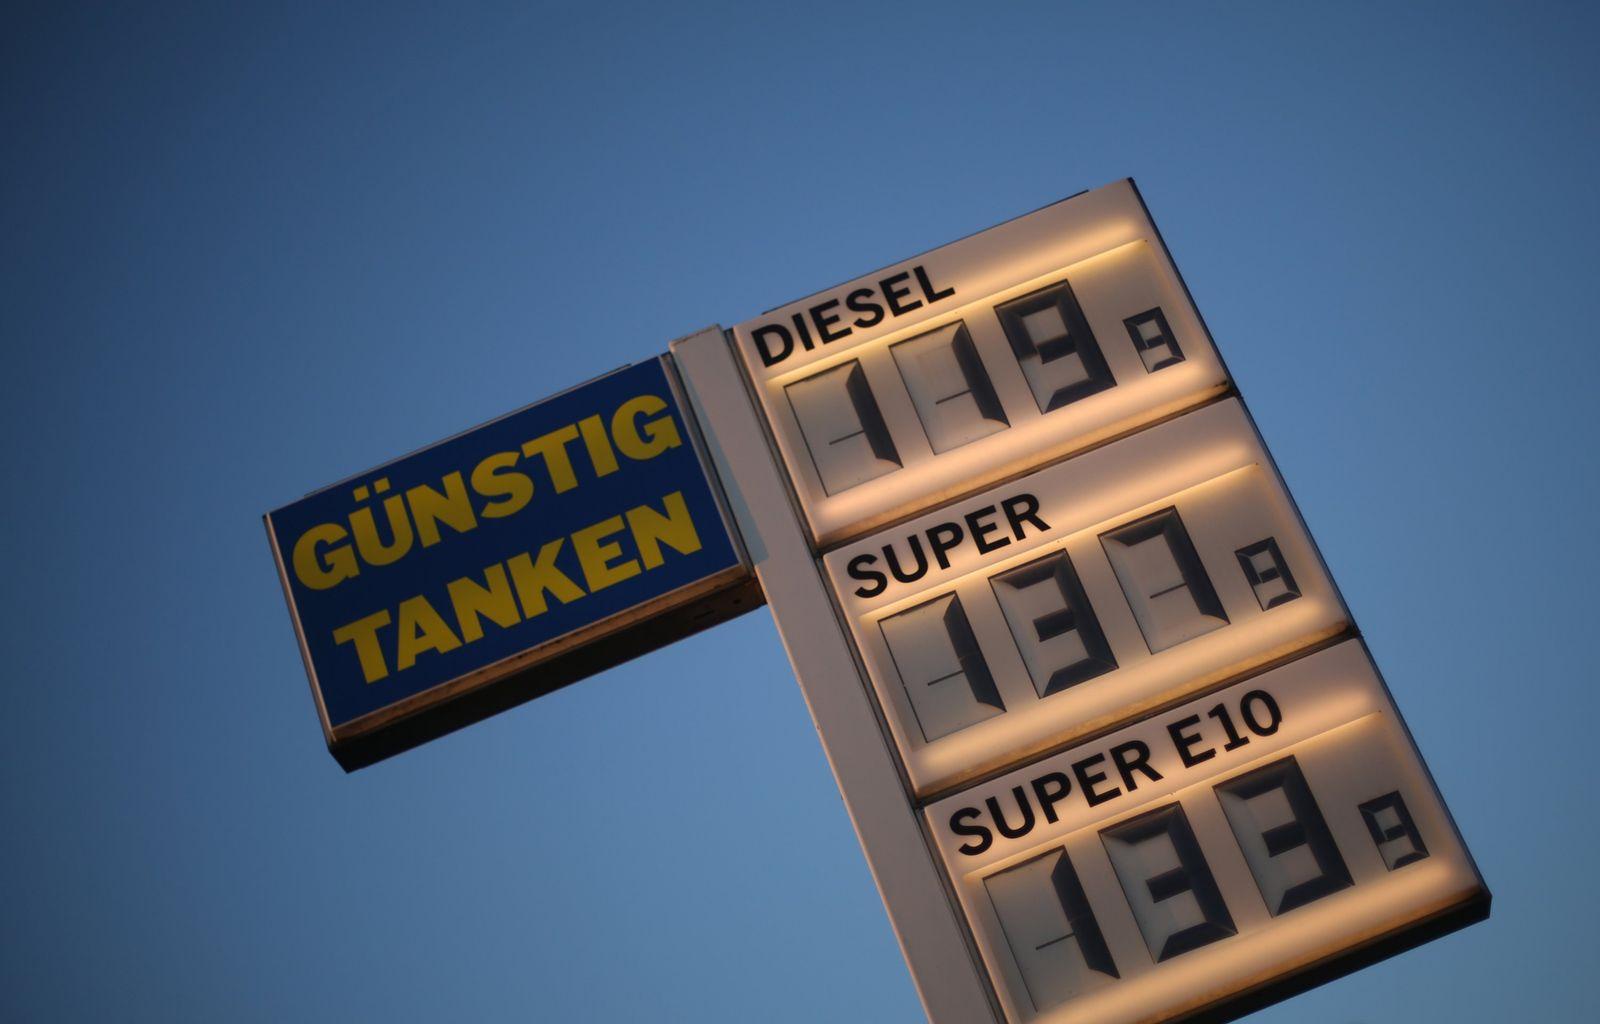 Tankstelle / Benzinpreis